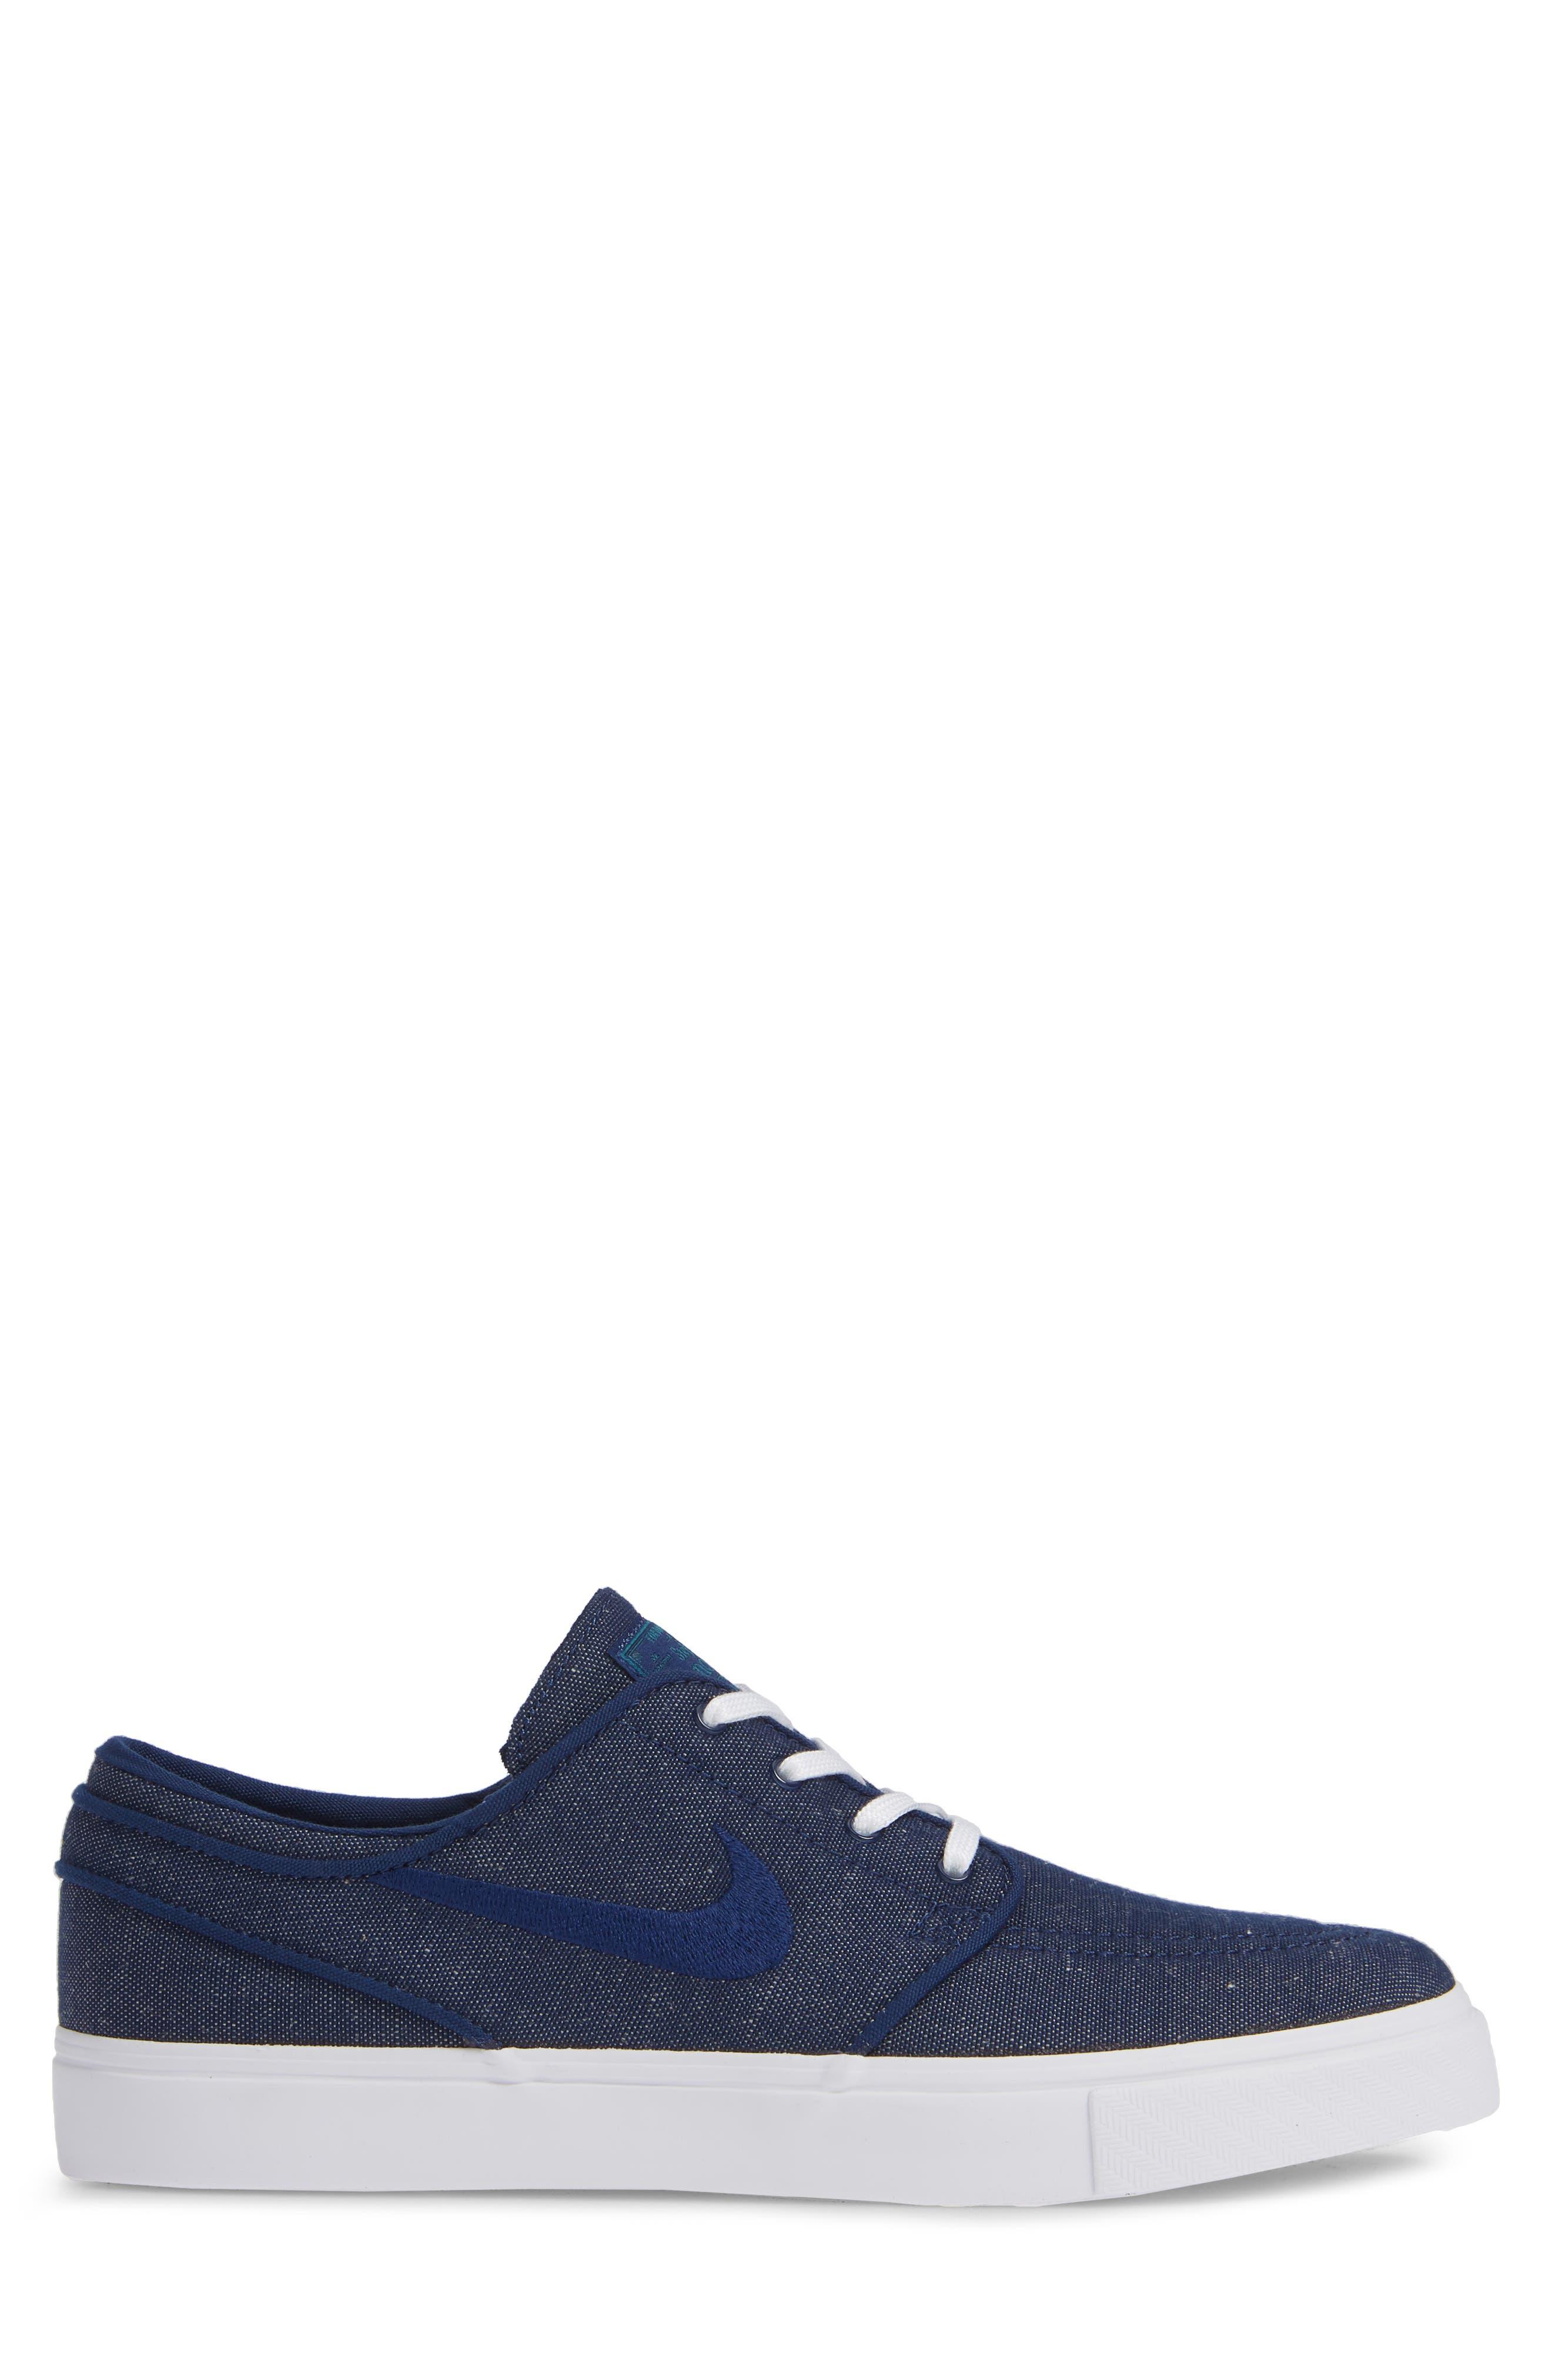 Zoom - Stefan Janoski SB Canvas Skate Shoe,                             Alternate thumbnail 131, color,